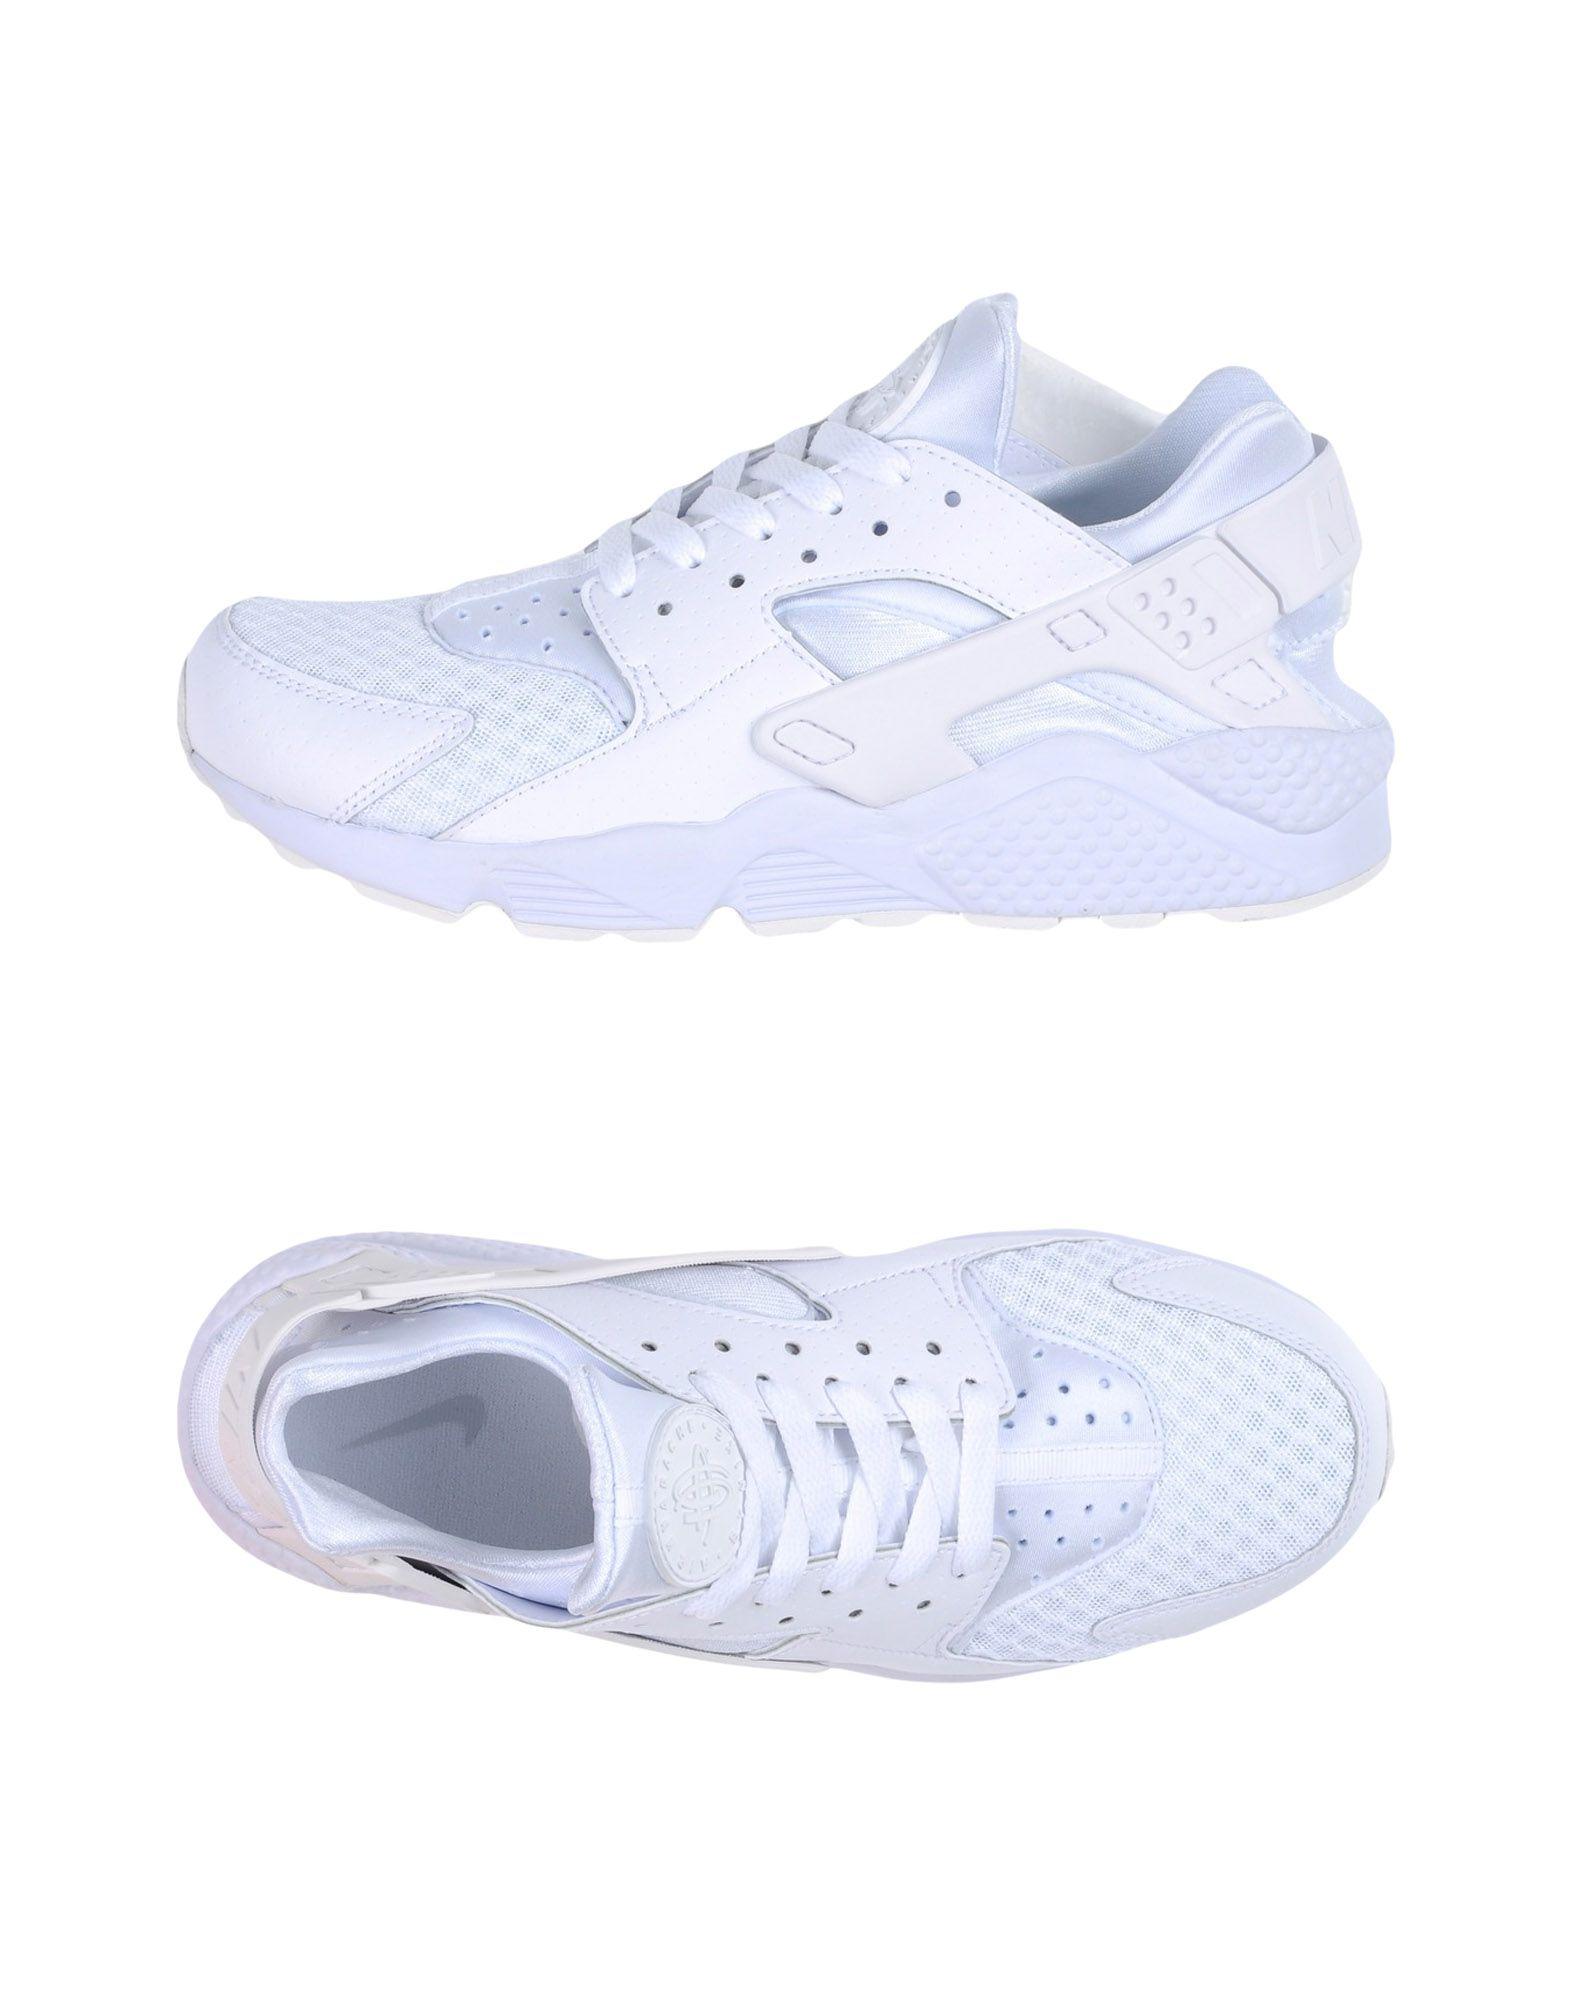 11336535AM Nike Sneakers Herren  11336535AM  Heiße Schuhe 62a76b